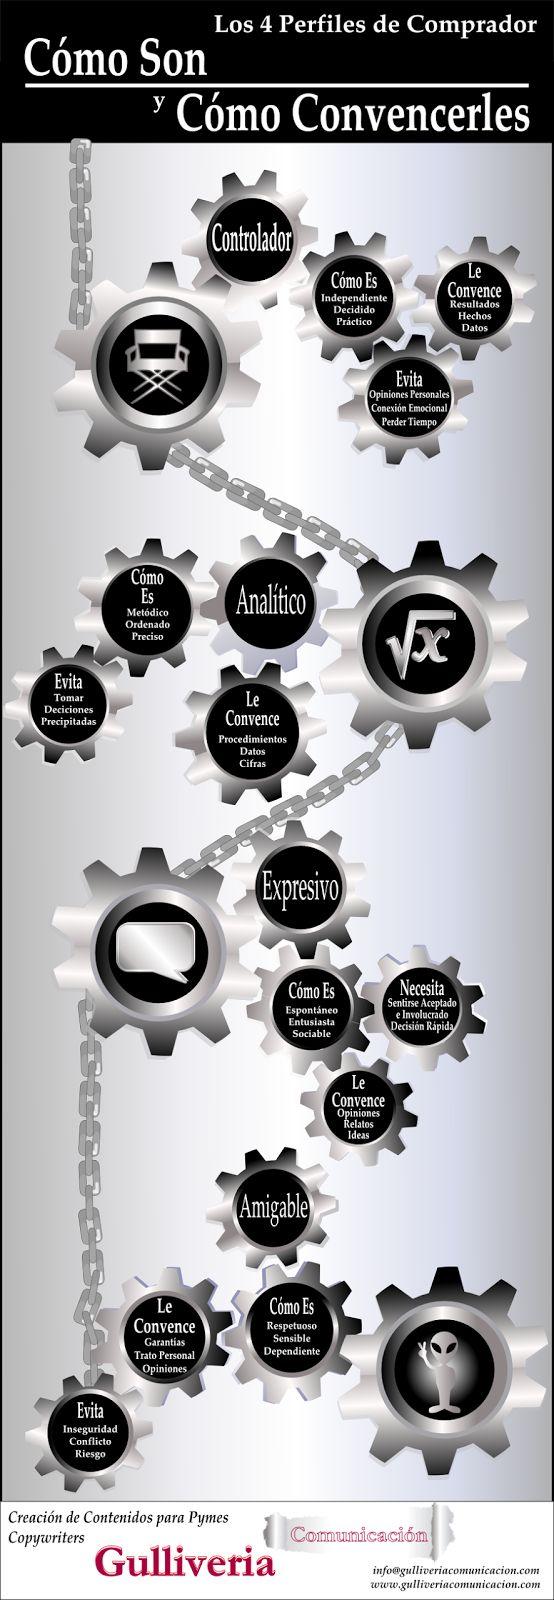 Los 4 perfiles del comprador #infografia #infographic #marketing